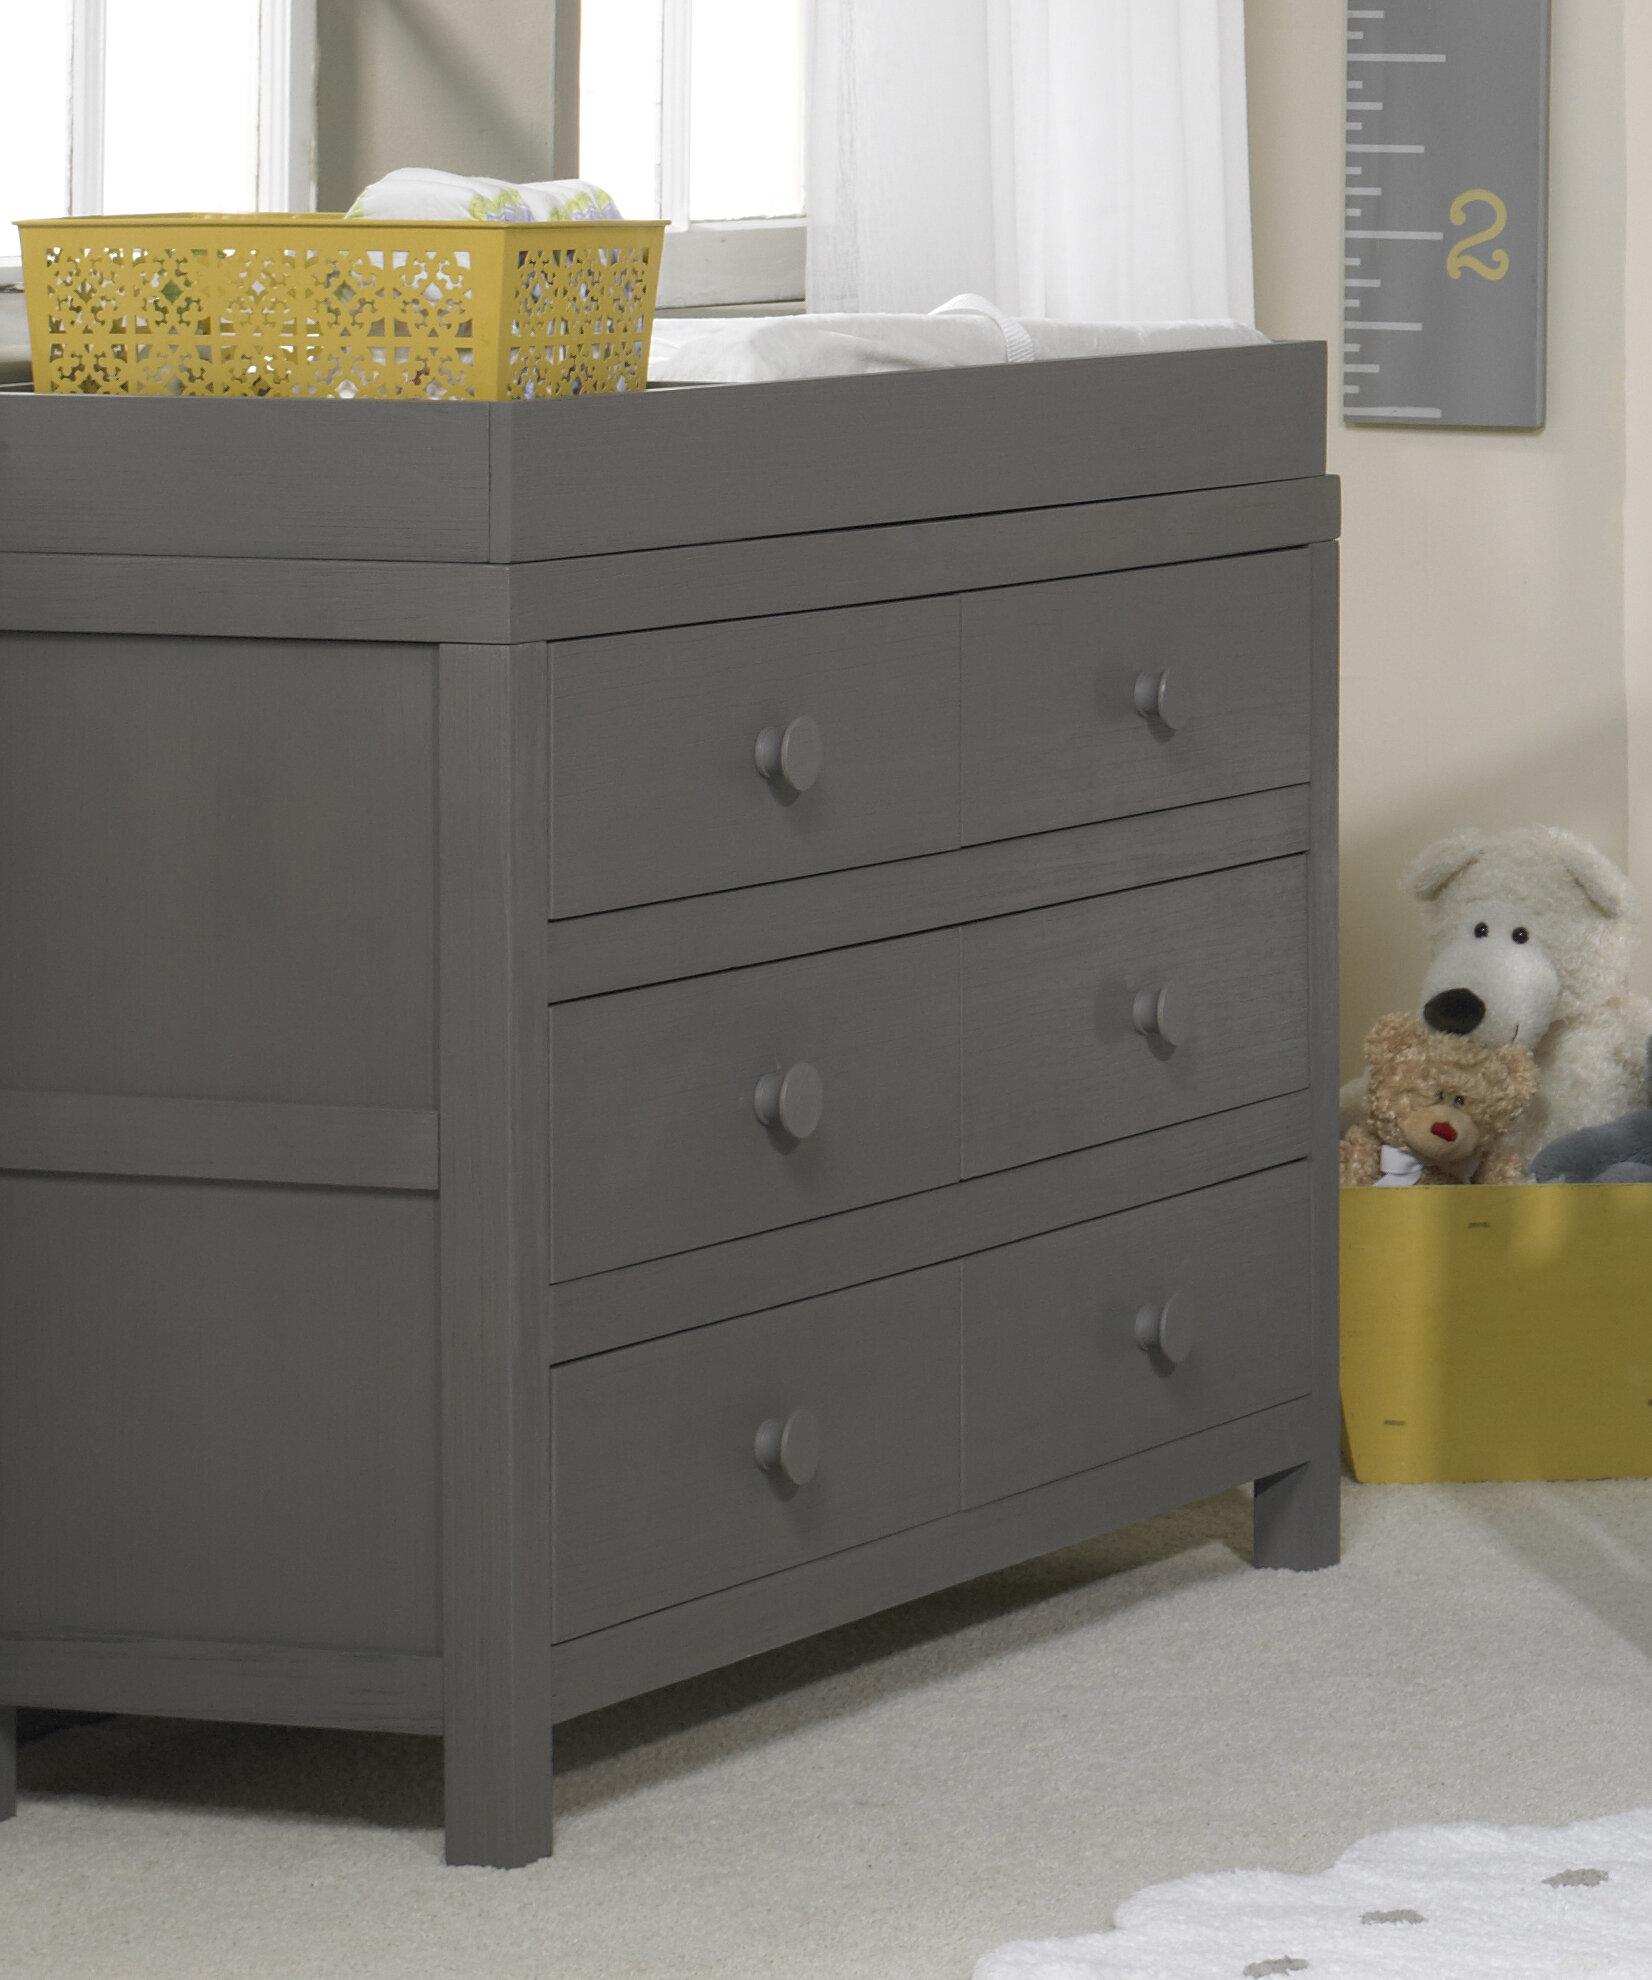 Paint Your Life Letto A Castello.Ti Amo Castello Rta 6 Drawer Double Dresser Reviews Wayfair